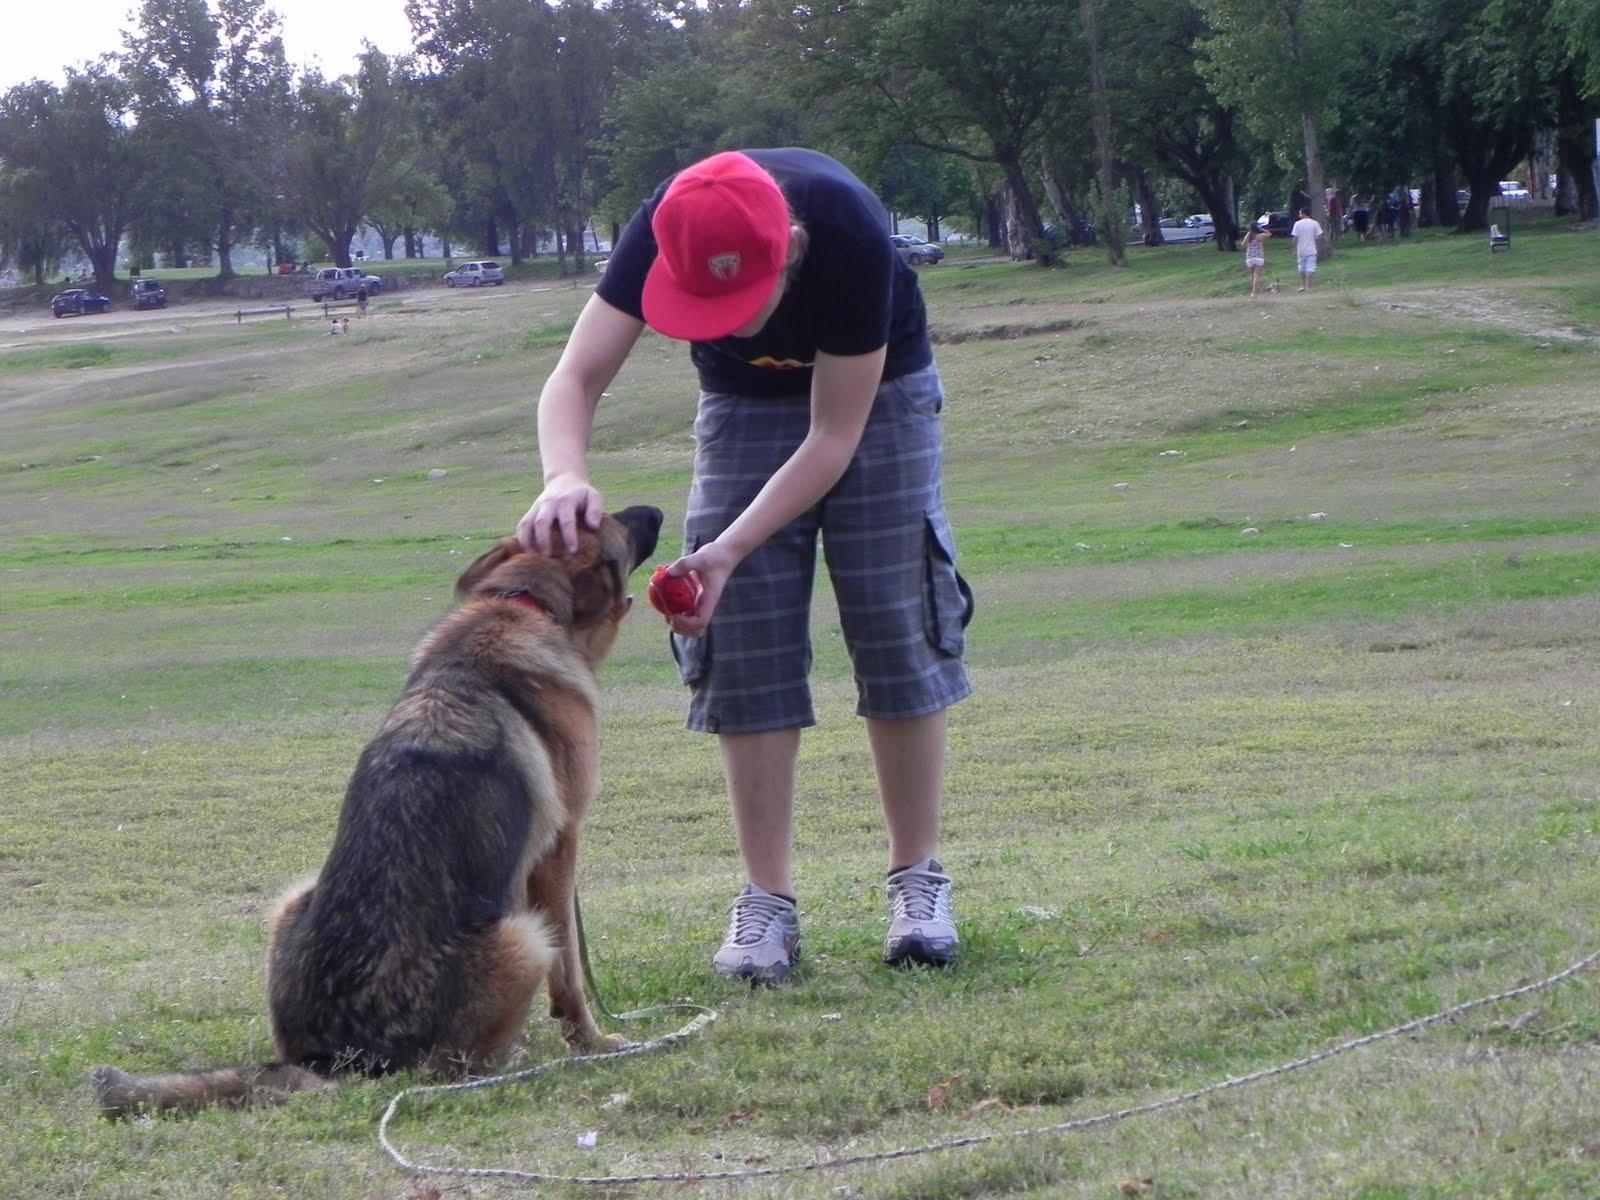 Perro obedeciendo a su dueño